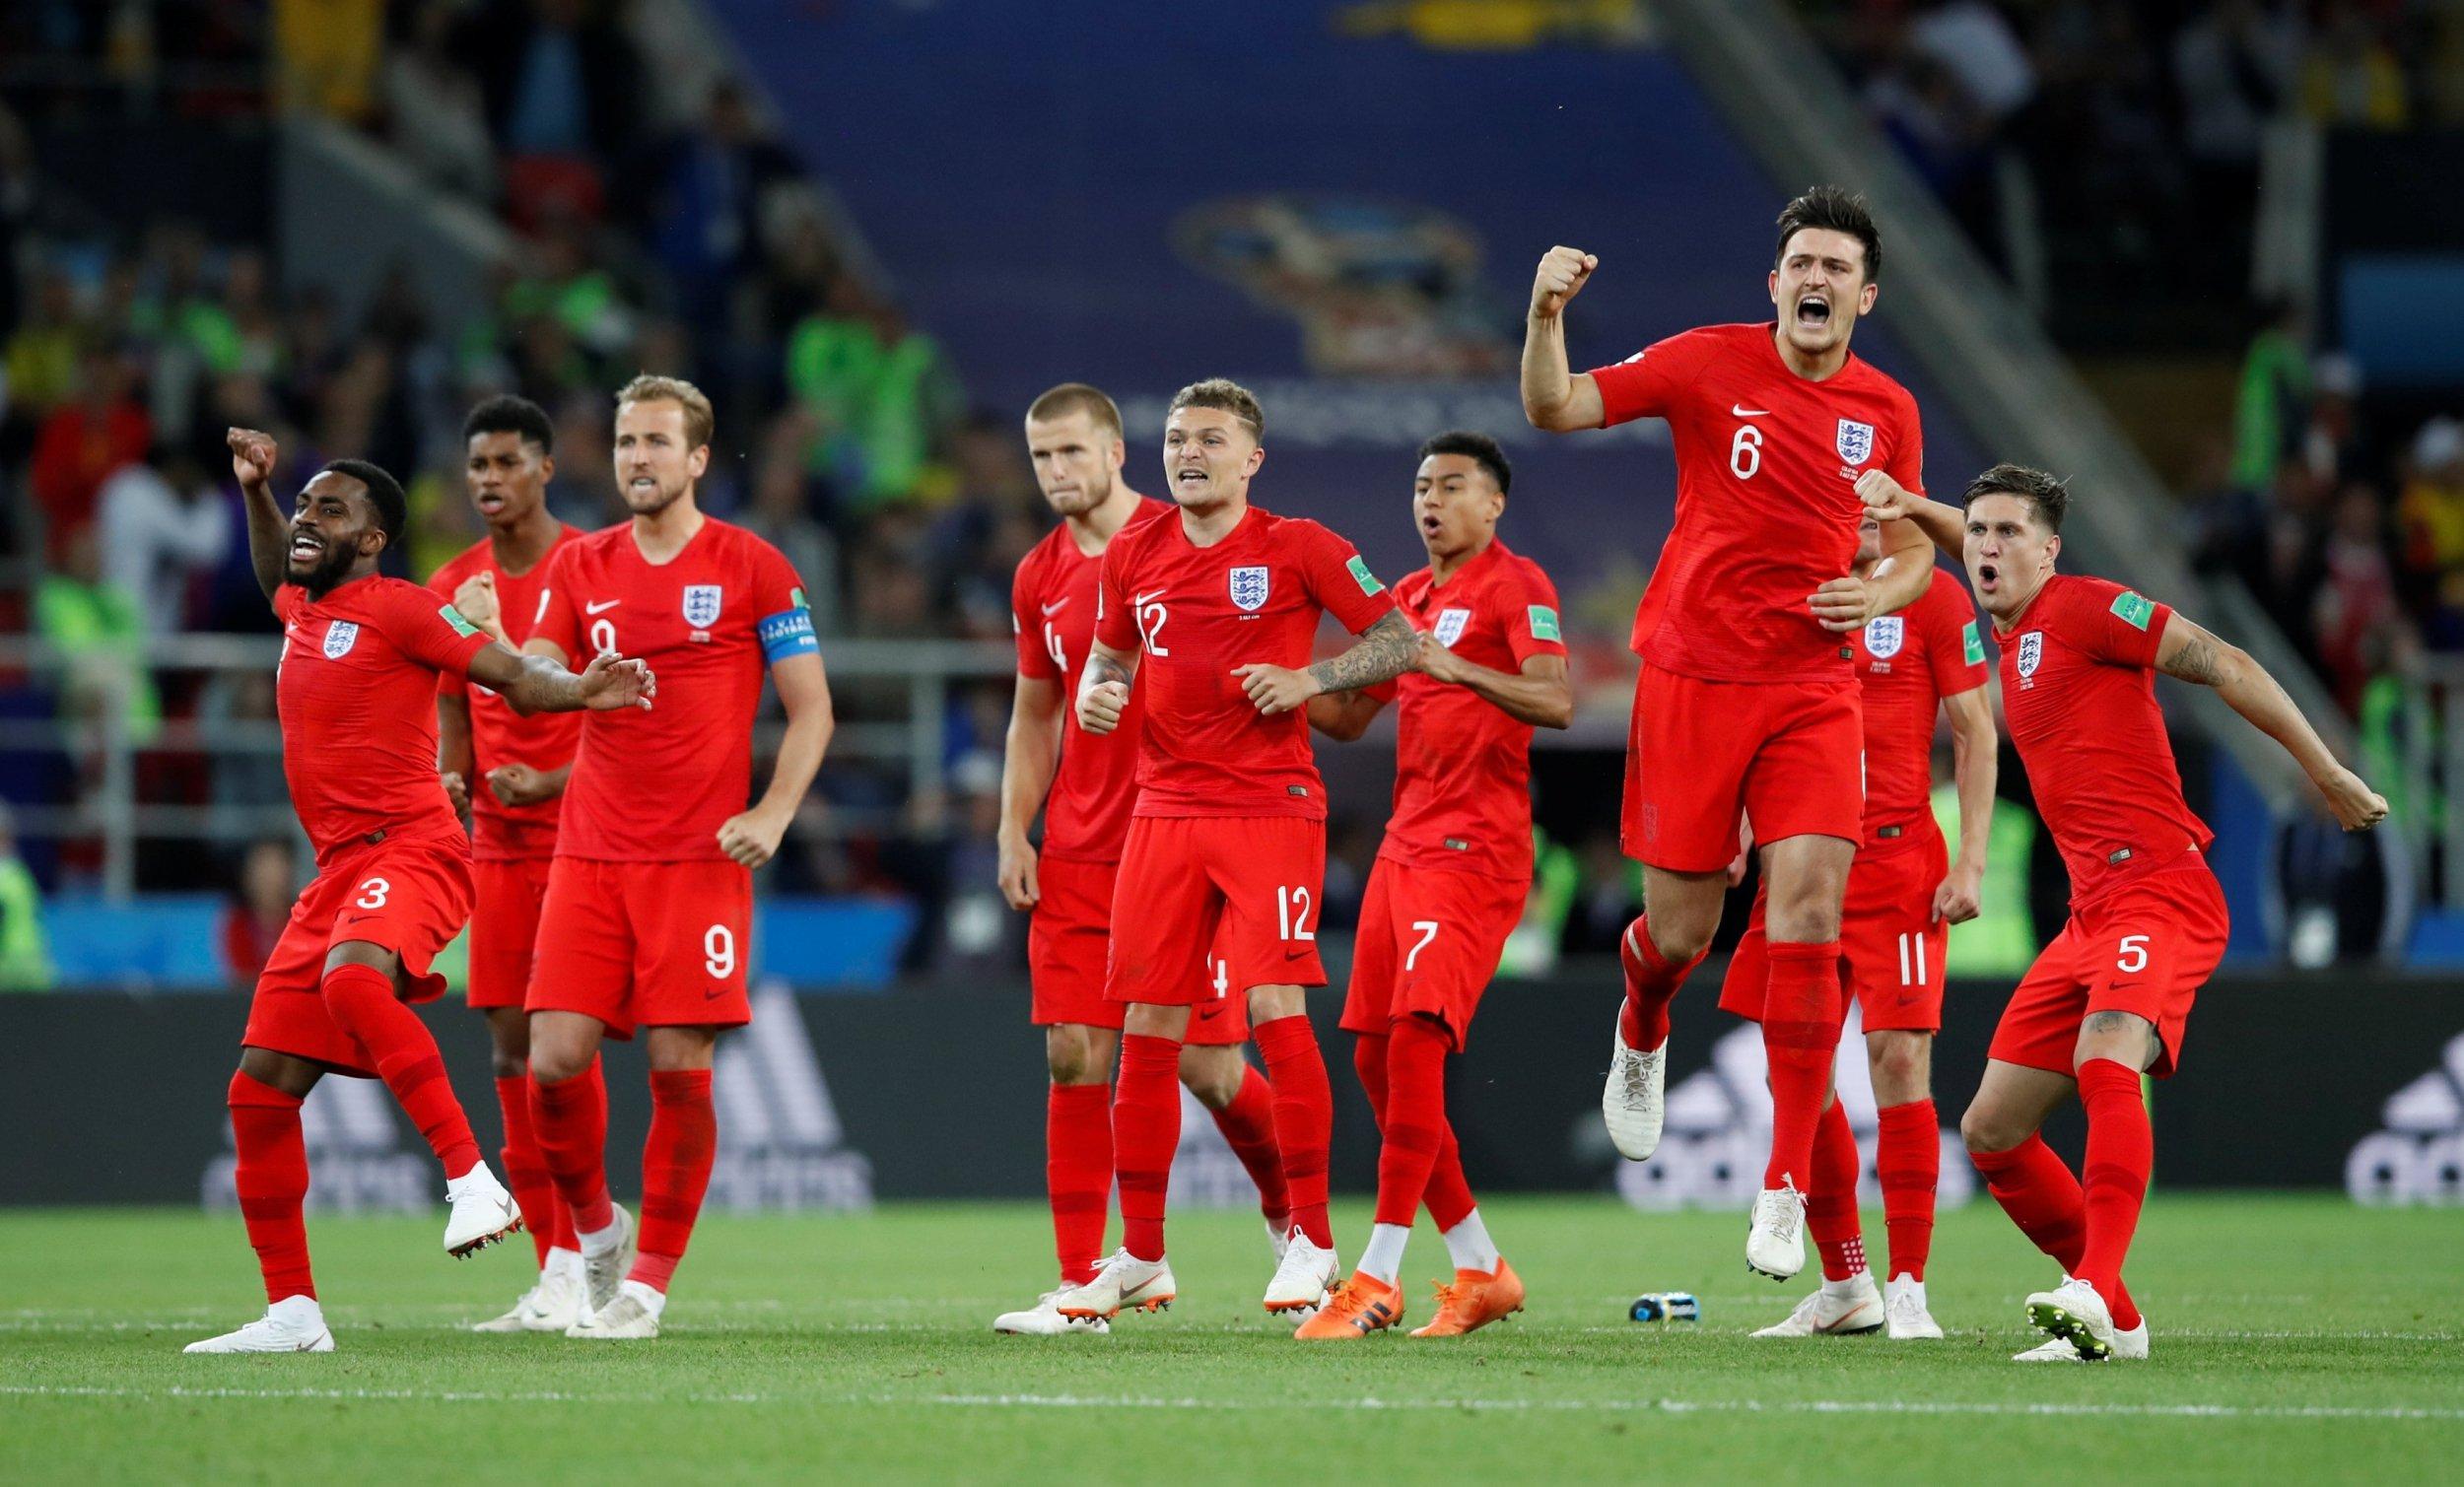 Image result for england national team 2018